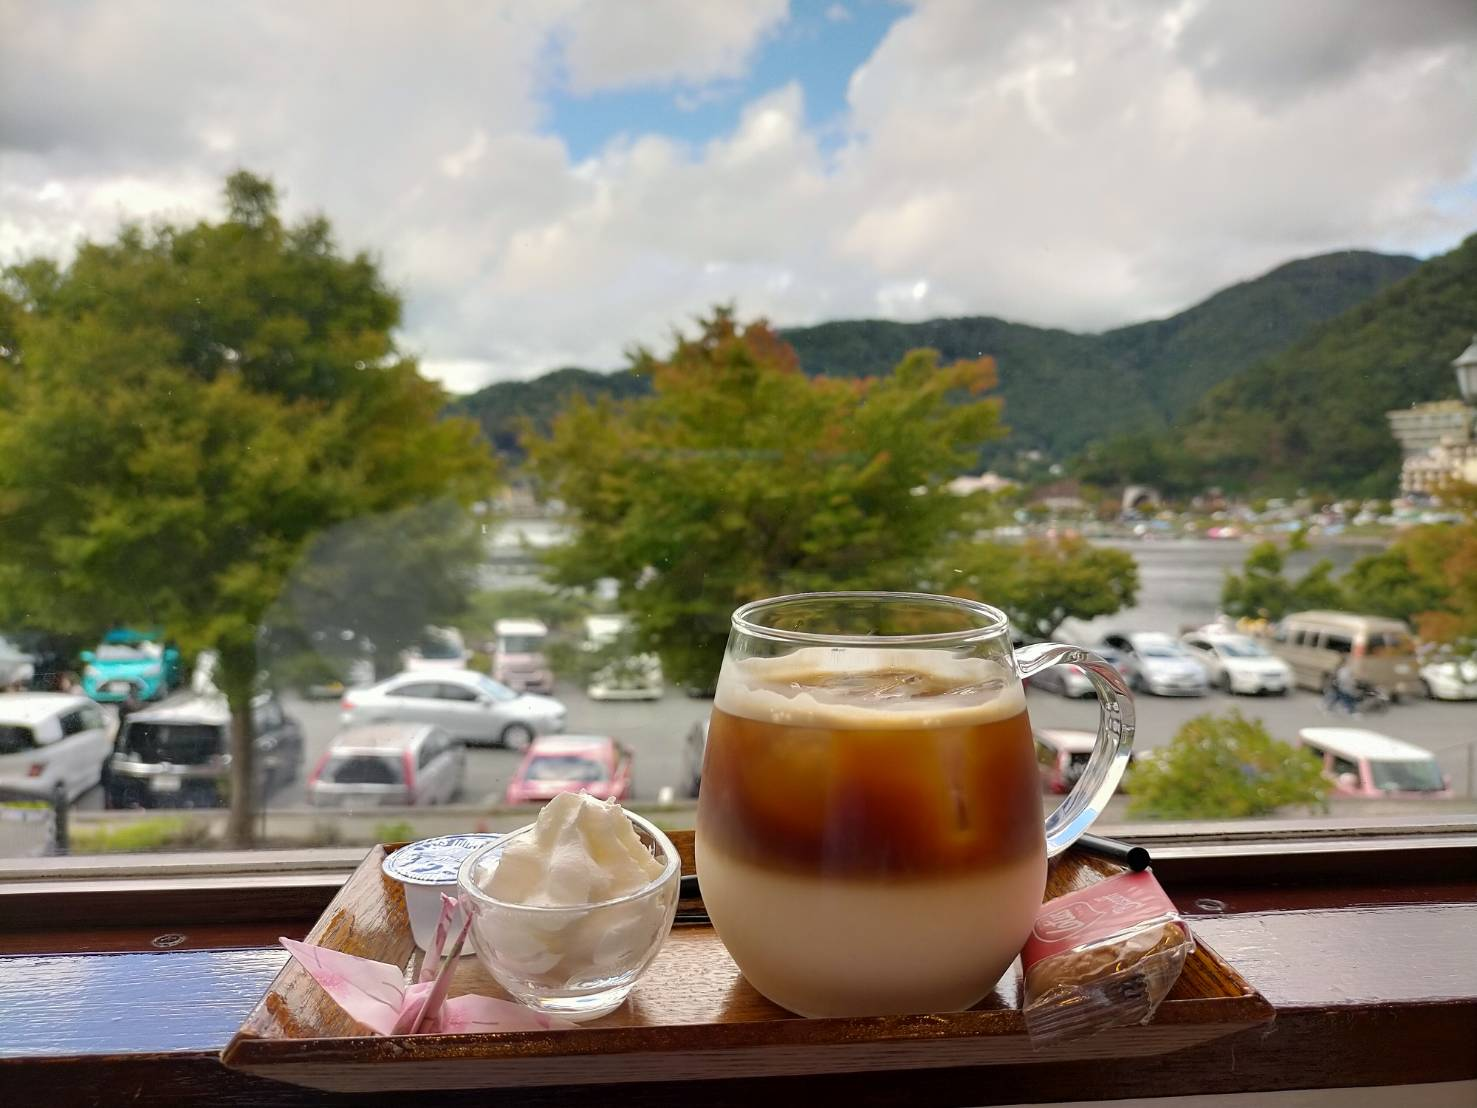 Lake-Side-Cafe-Ku-3 山梨県